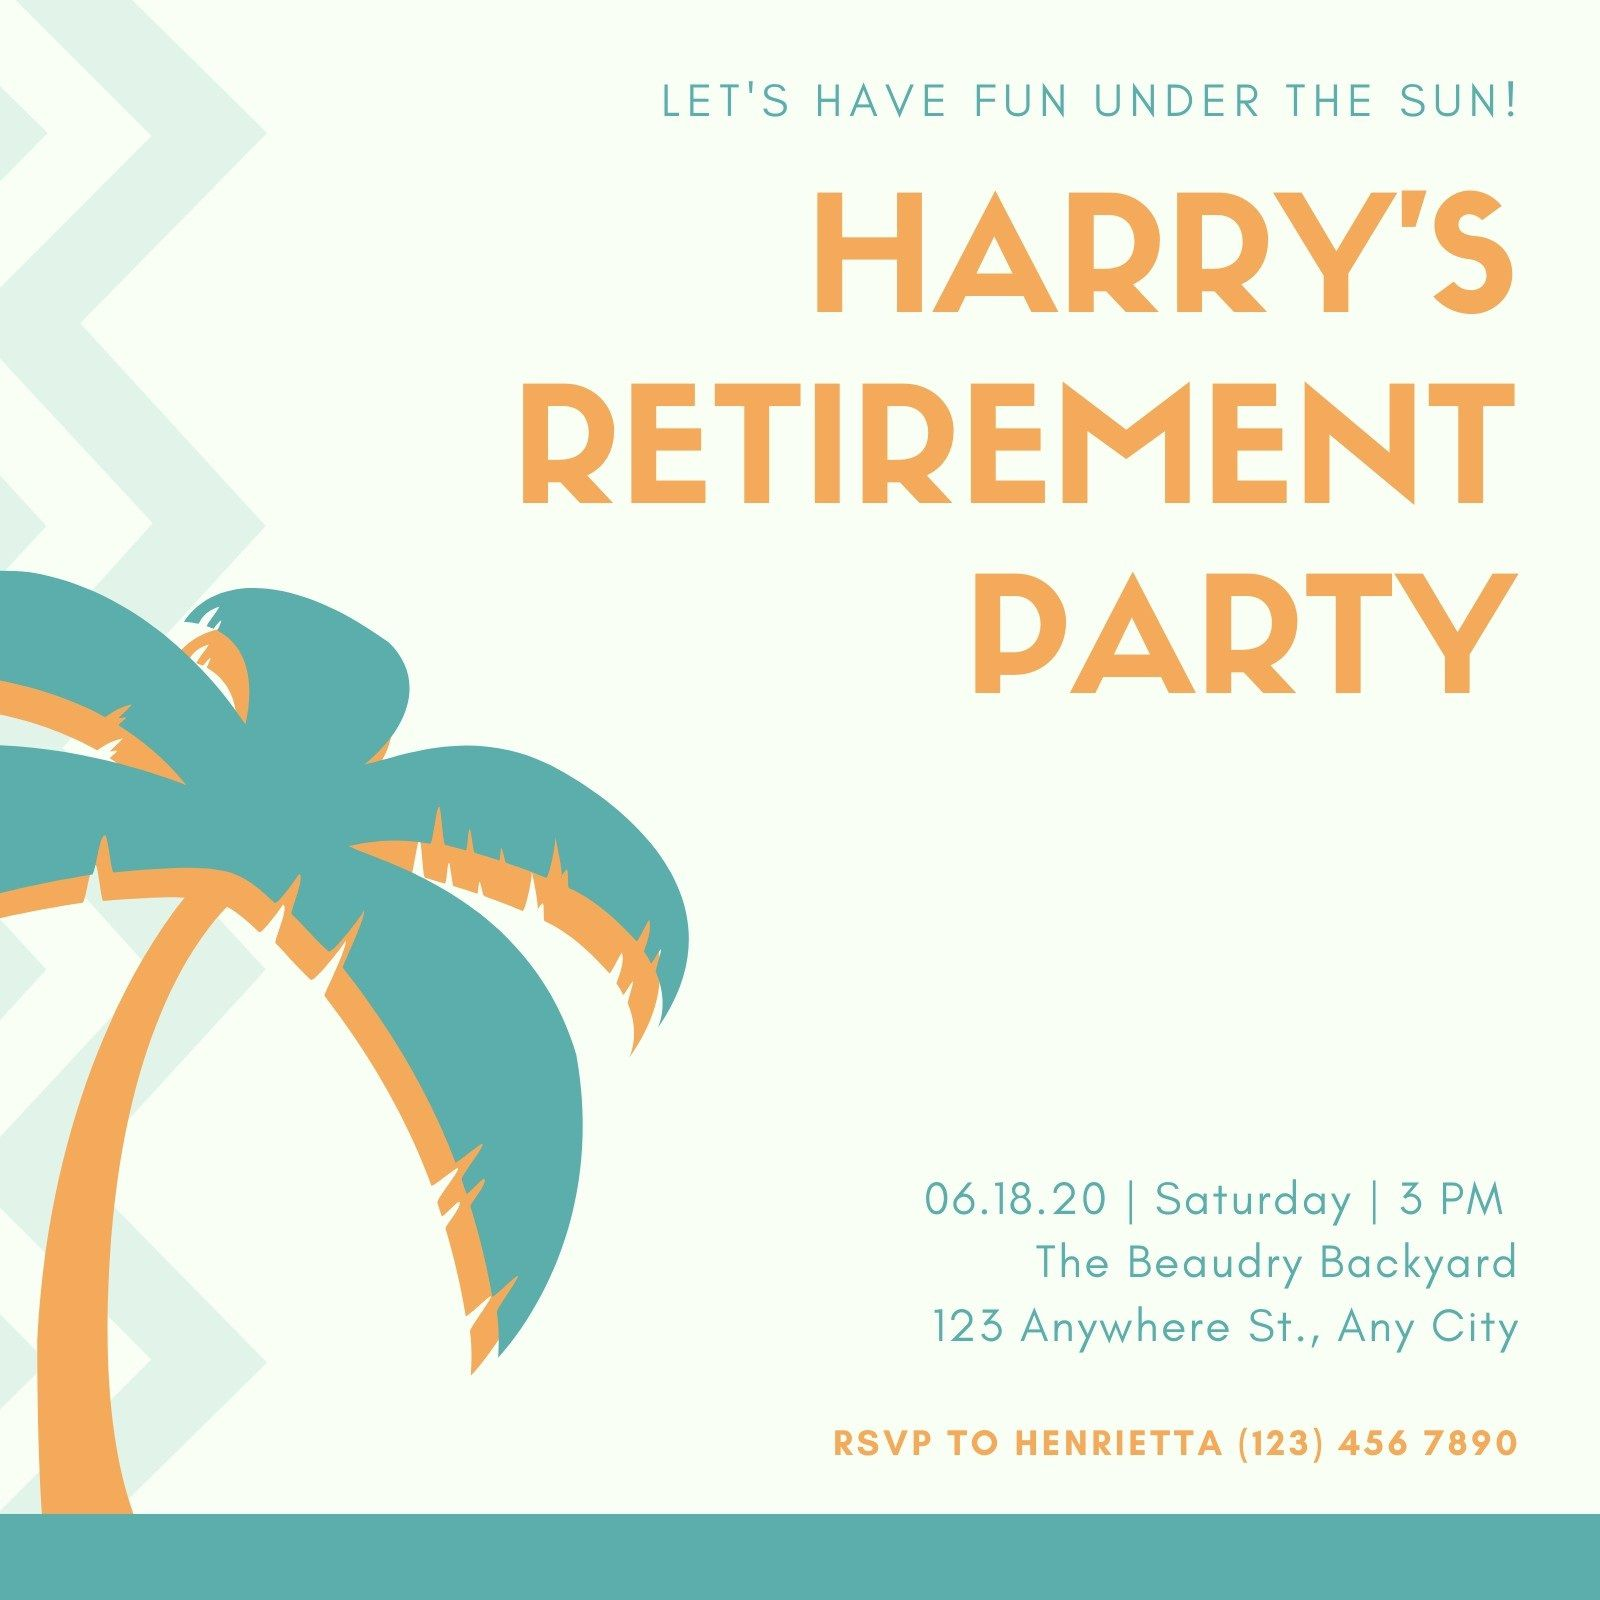 006 Beautiful Retirement Party Invite Template Design  Invitation Online M Word FreeFull